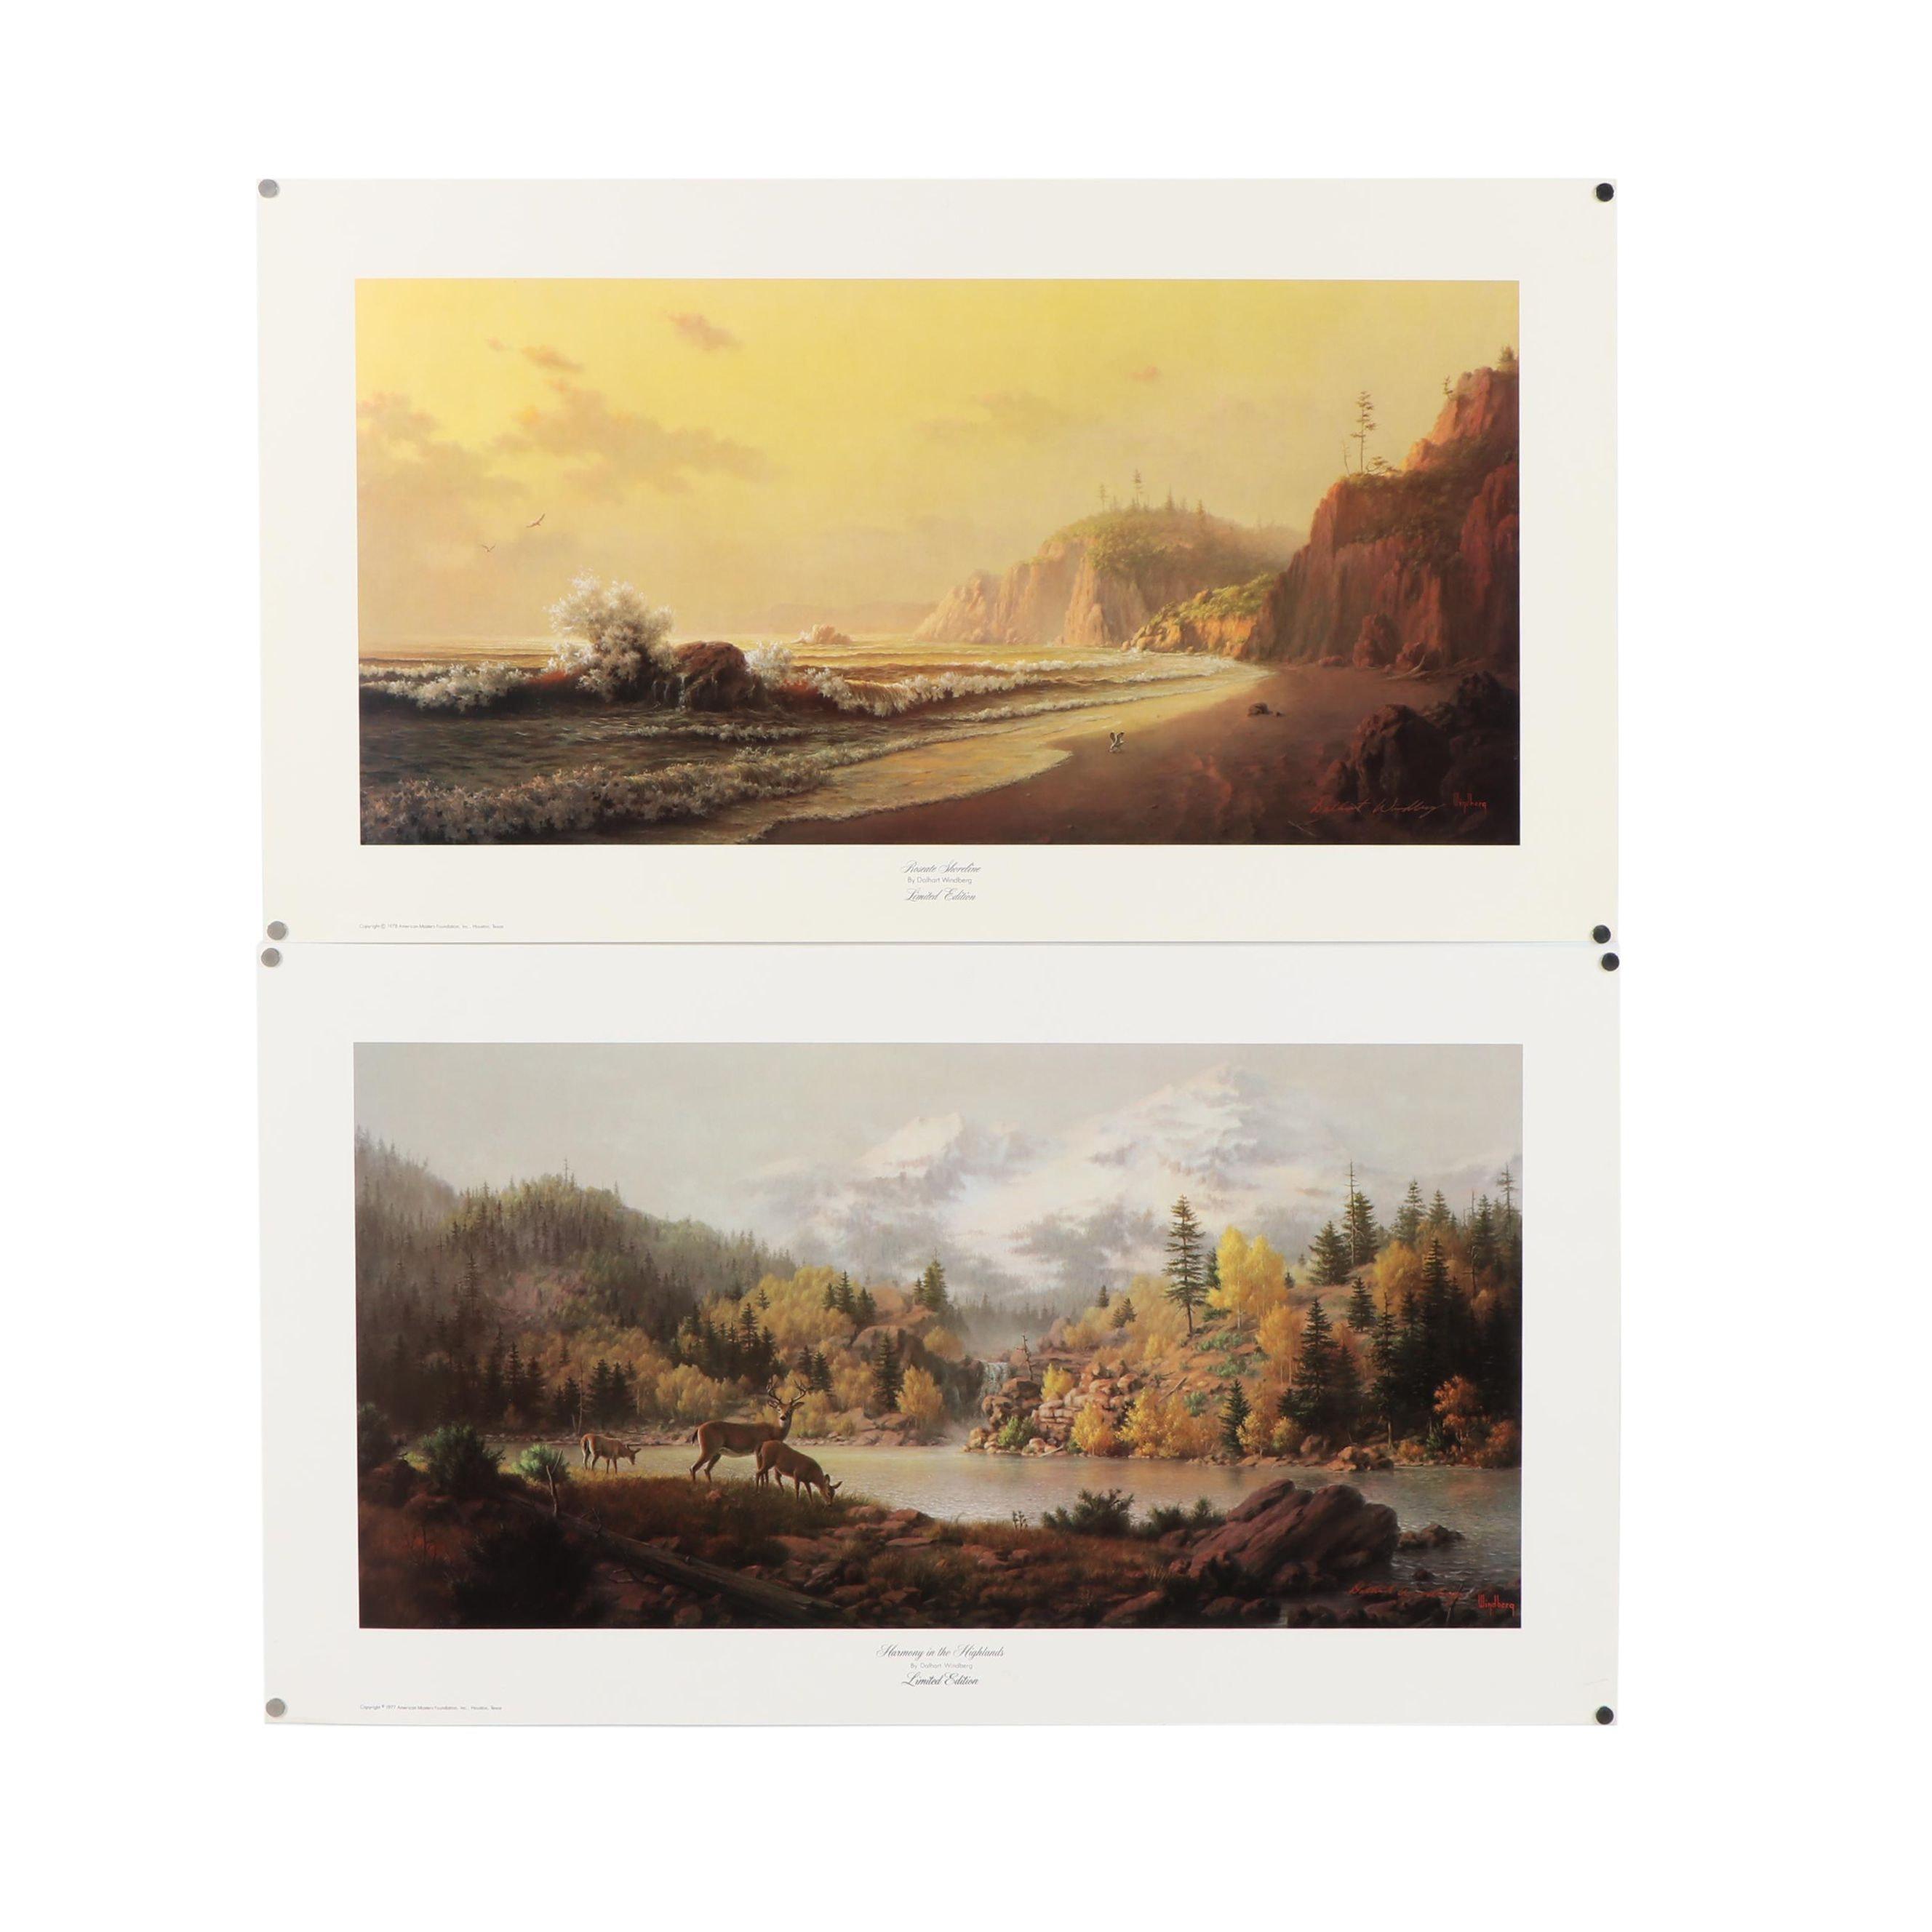 Dalhart Windberg Offset Lithographs